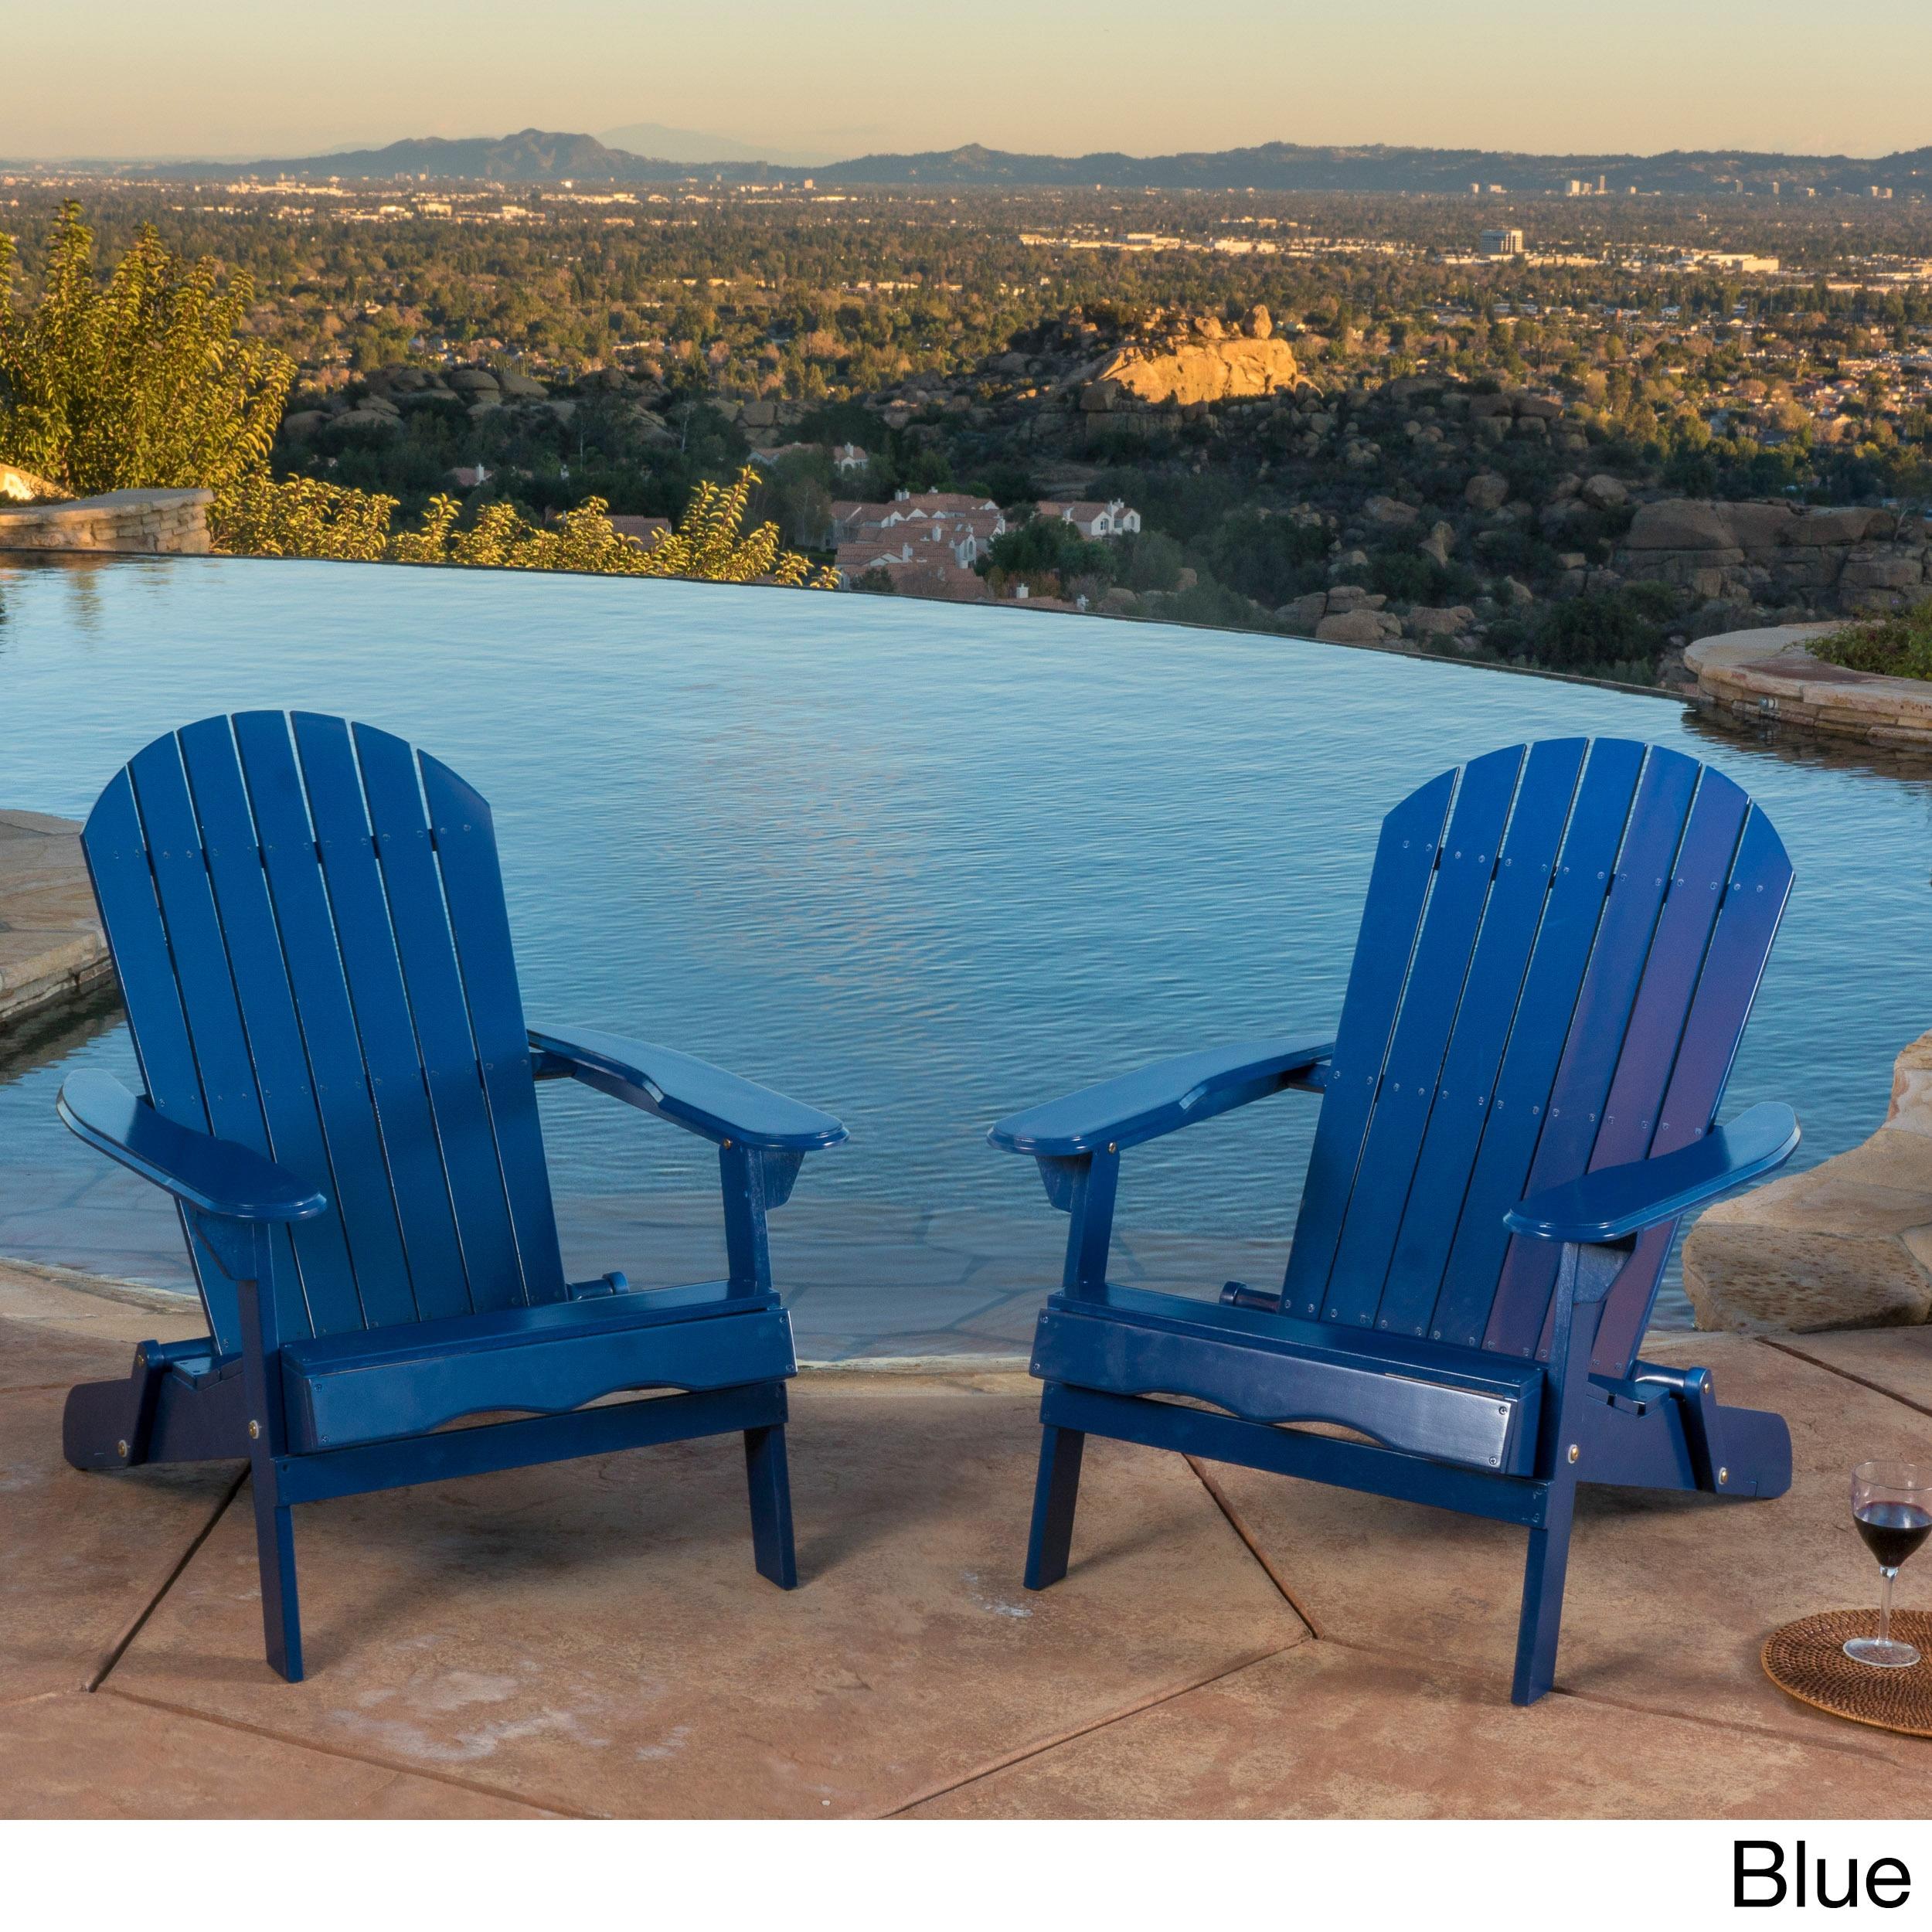 Hanlee Outdoor Folding Wood Adirondack Chair Set Of